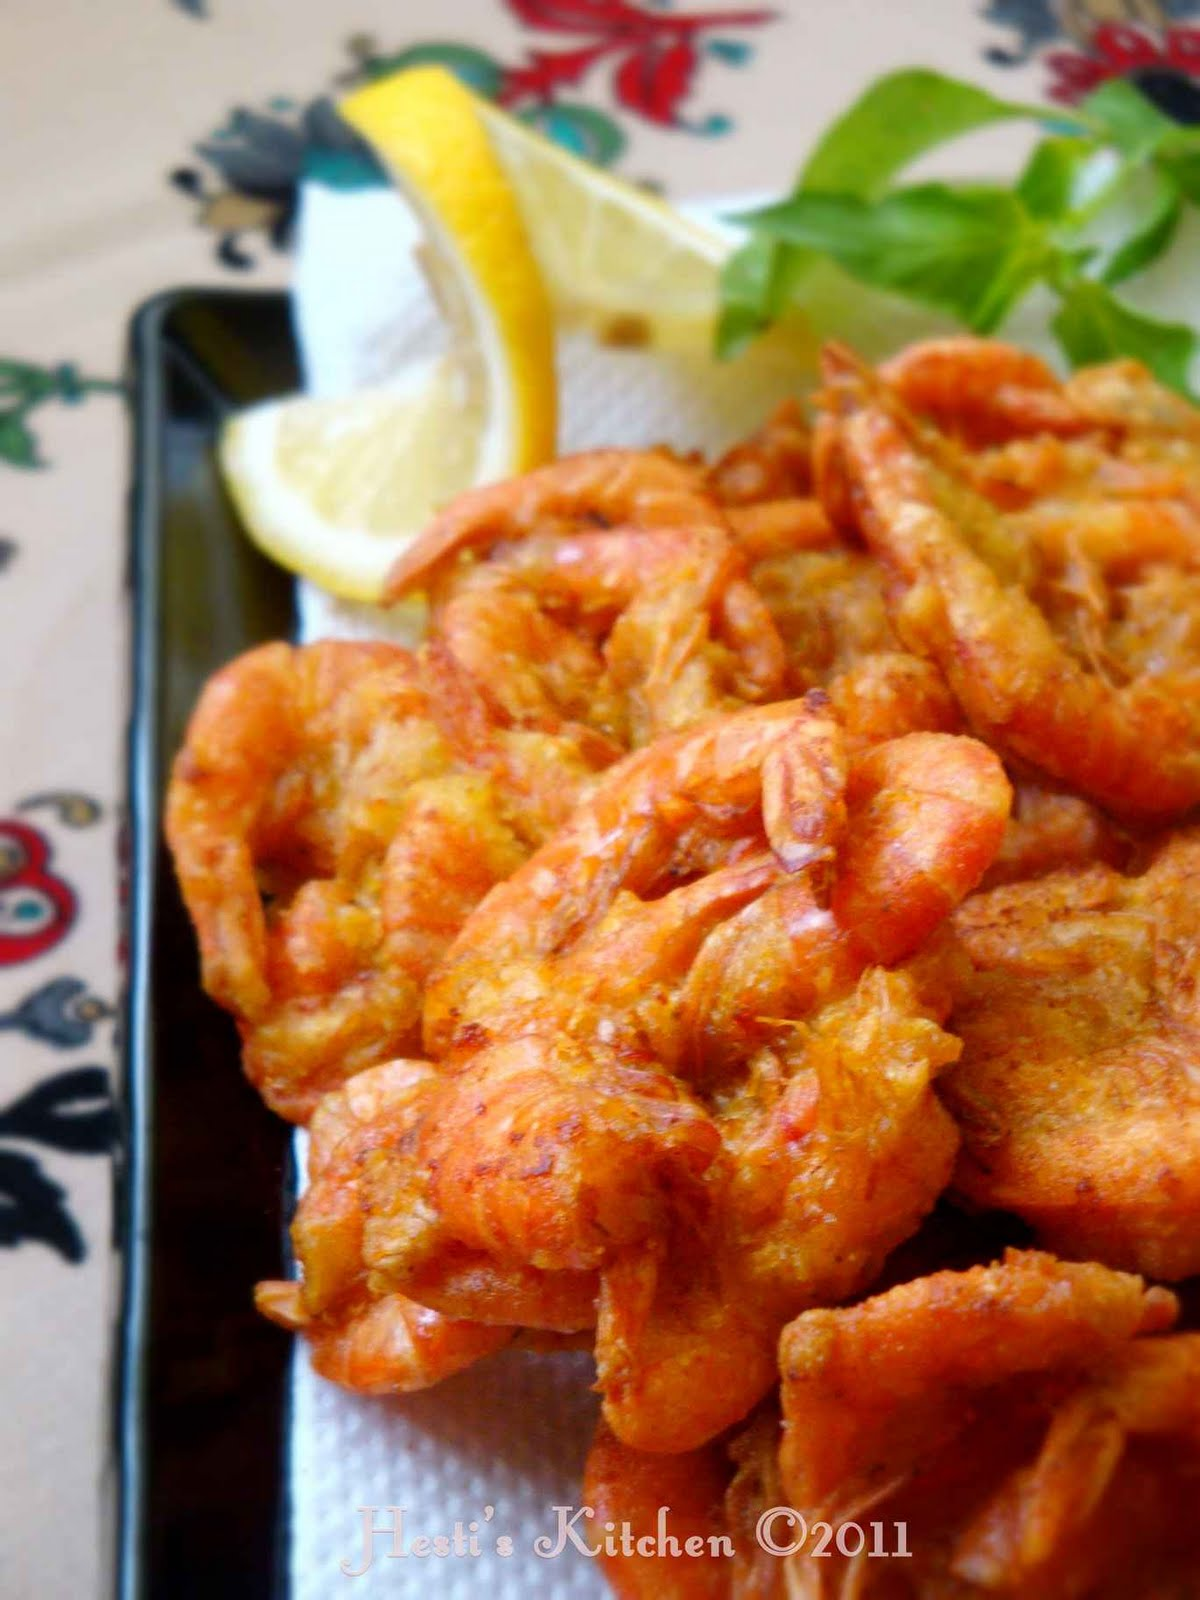 Resep Udang Tepung : resep, udang, tepung, HESTI'S, KITCHEN, Yummy, Tummy:, Udang, Goreng, Tepung